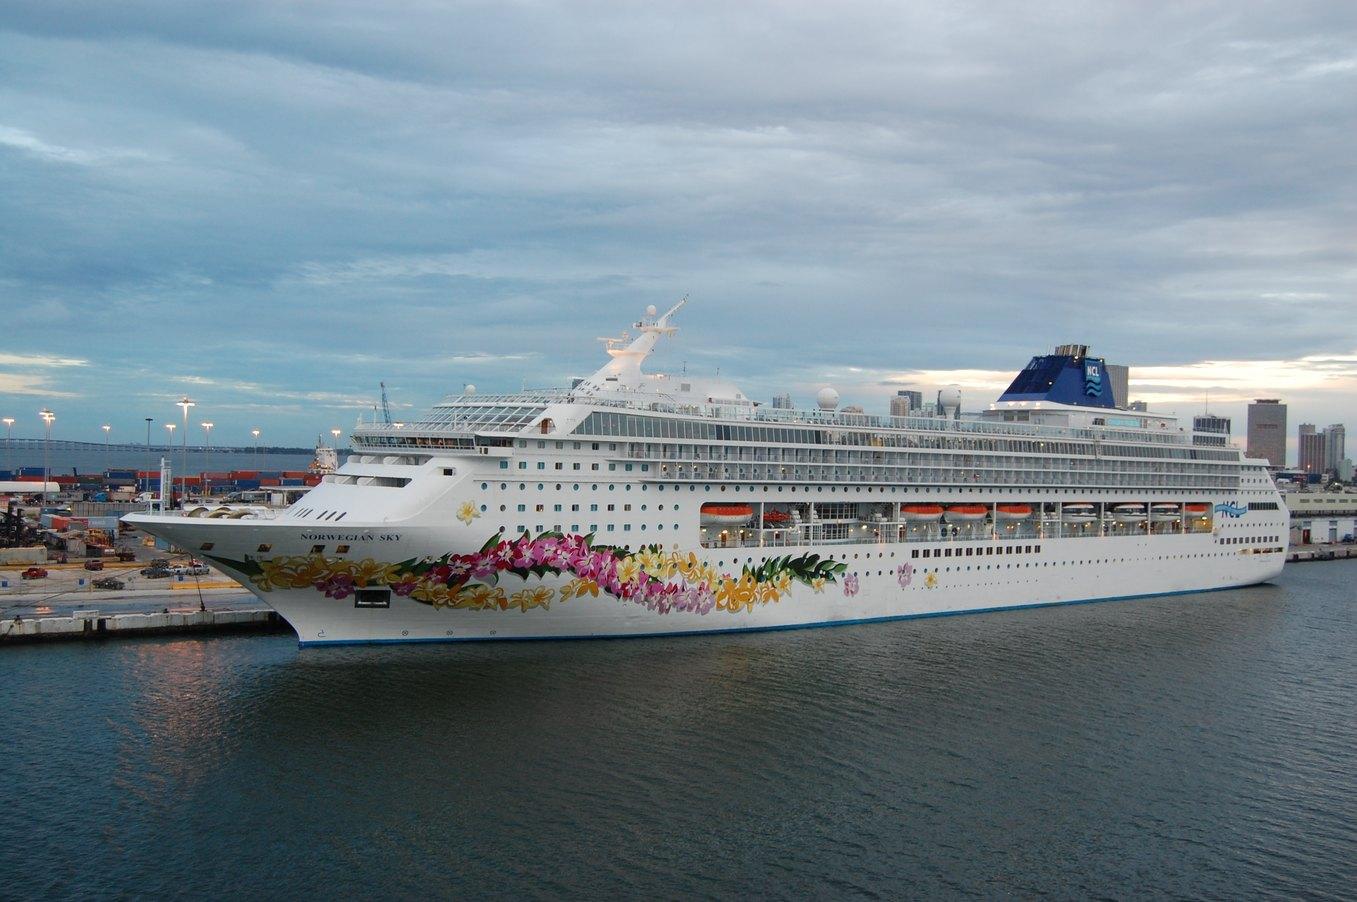 sea-boat-ship-vacation-travel-transportation-1331346-pxhere.com.jpg